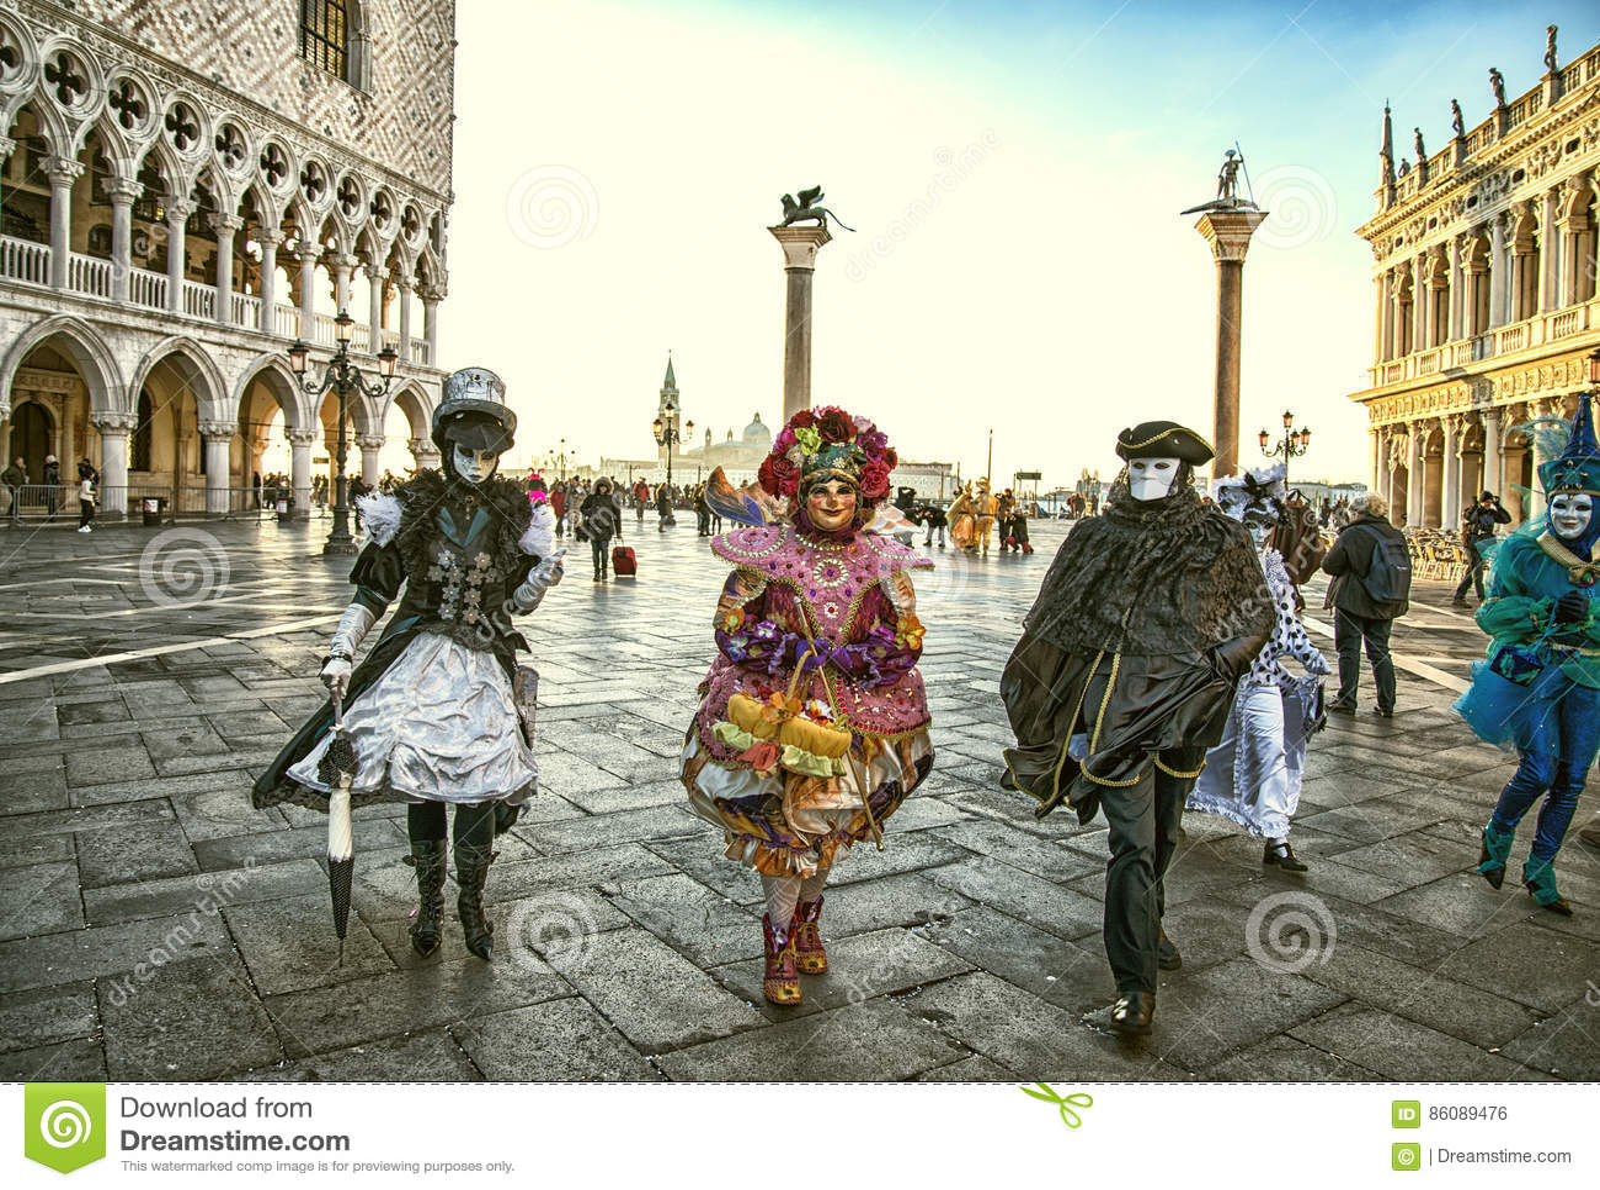 Povos nas máscaras e trajes em carnival-06 Venetian 02 Veneza 2016